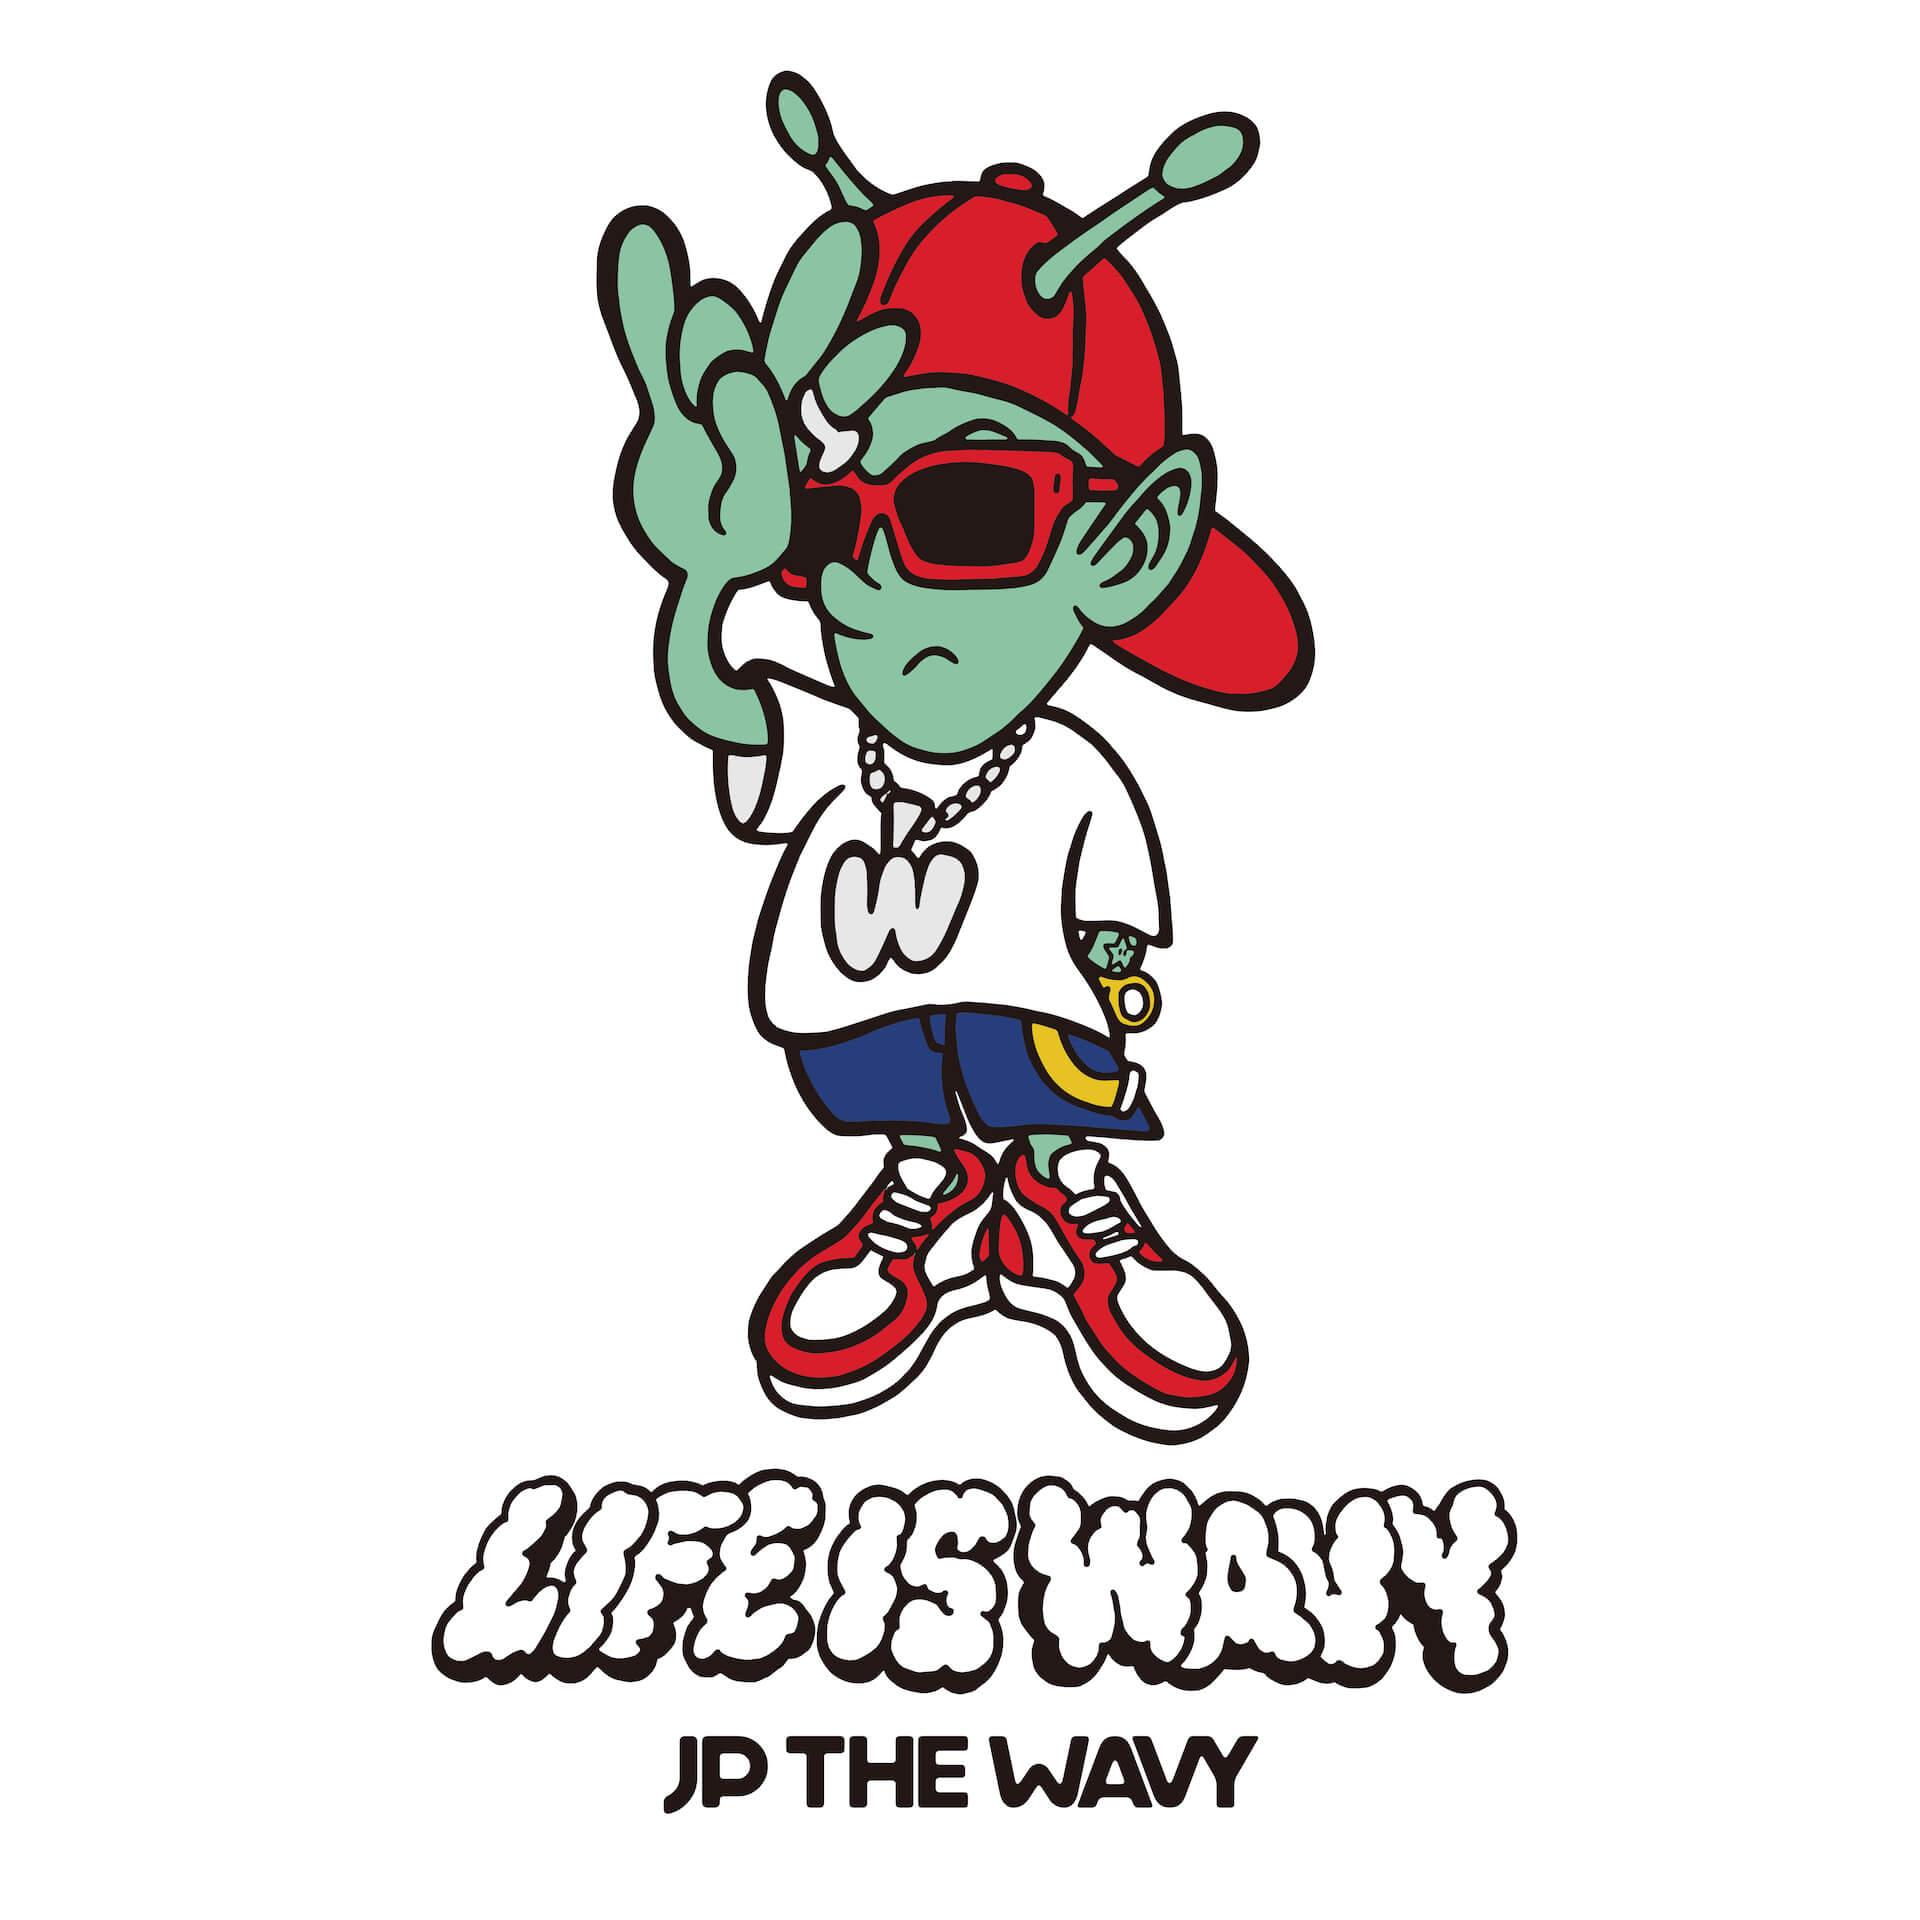 JP THE WAVYの1stアルバム『LIFE IS WAVY』のVERDY作アートワーク&トラックリスト公開|VERBAL、MIYACHI、Jay Park、LEXら参加 music200325_jpthewavy_main